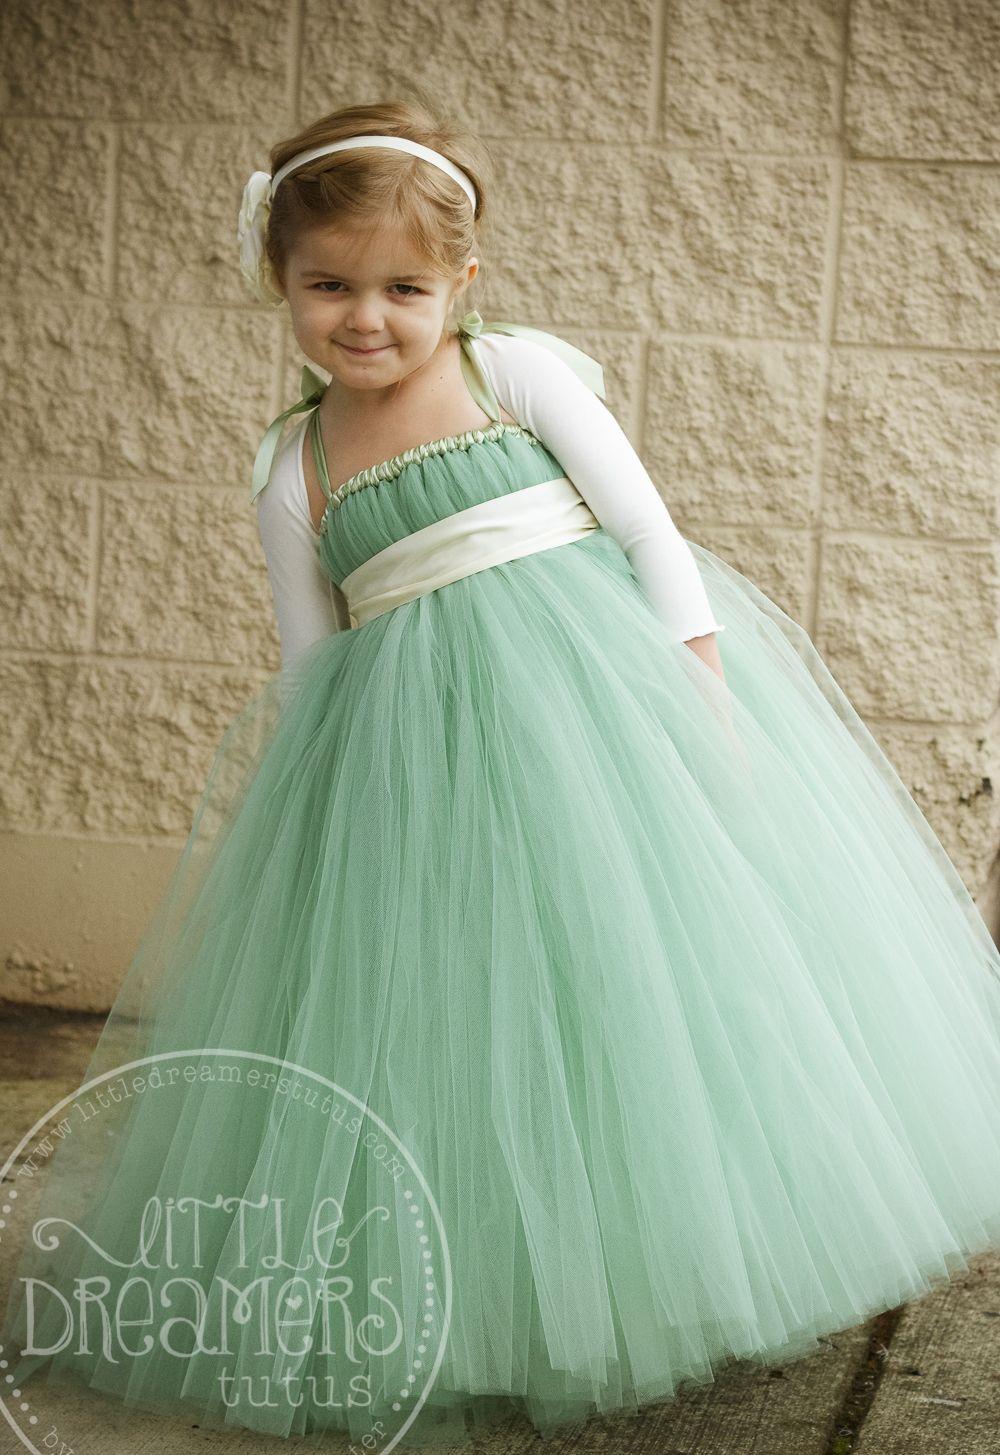 cbe8d7fd flowergirl - mint green tutu dress with a navy sash | P3 Challenge ...